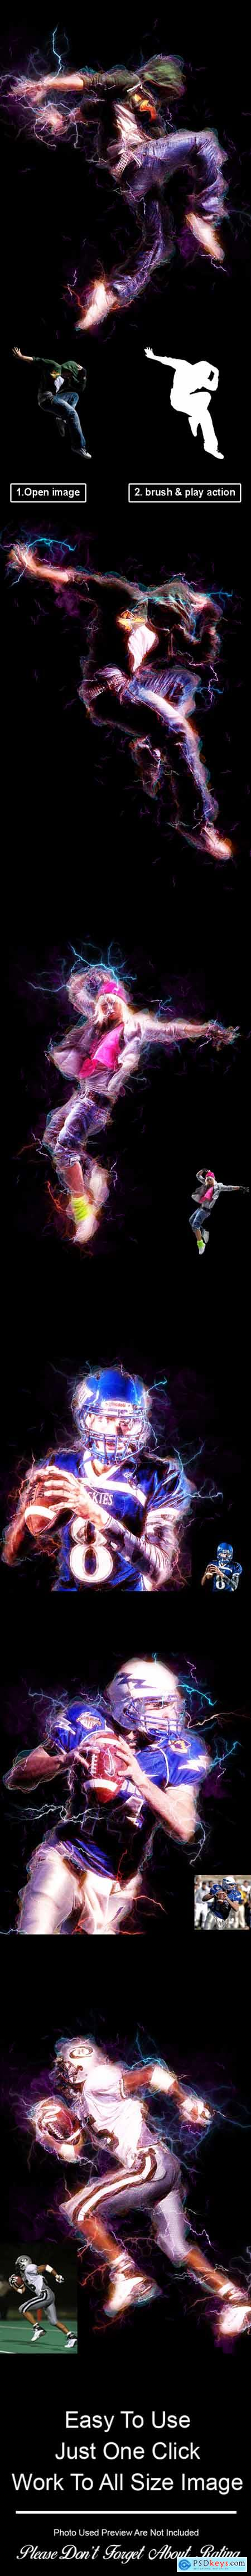 Power Photoshop Action Vol 3 29673624